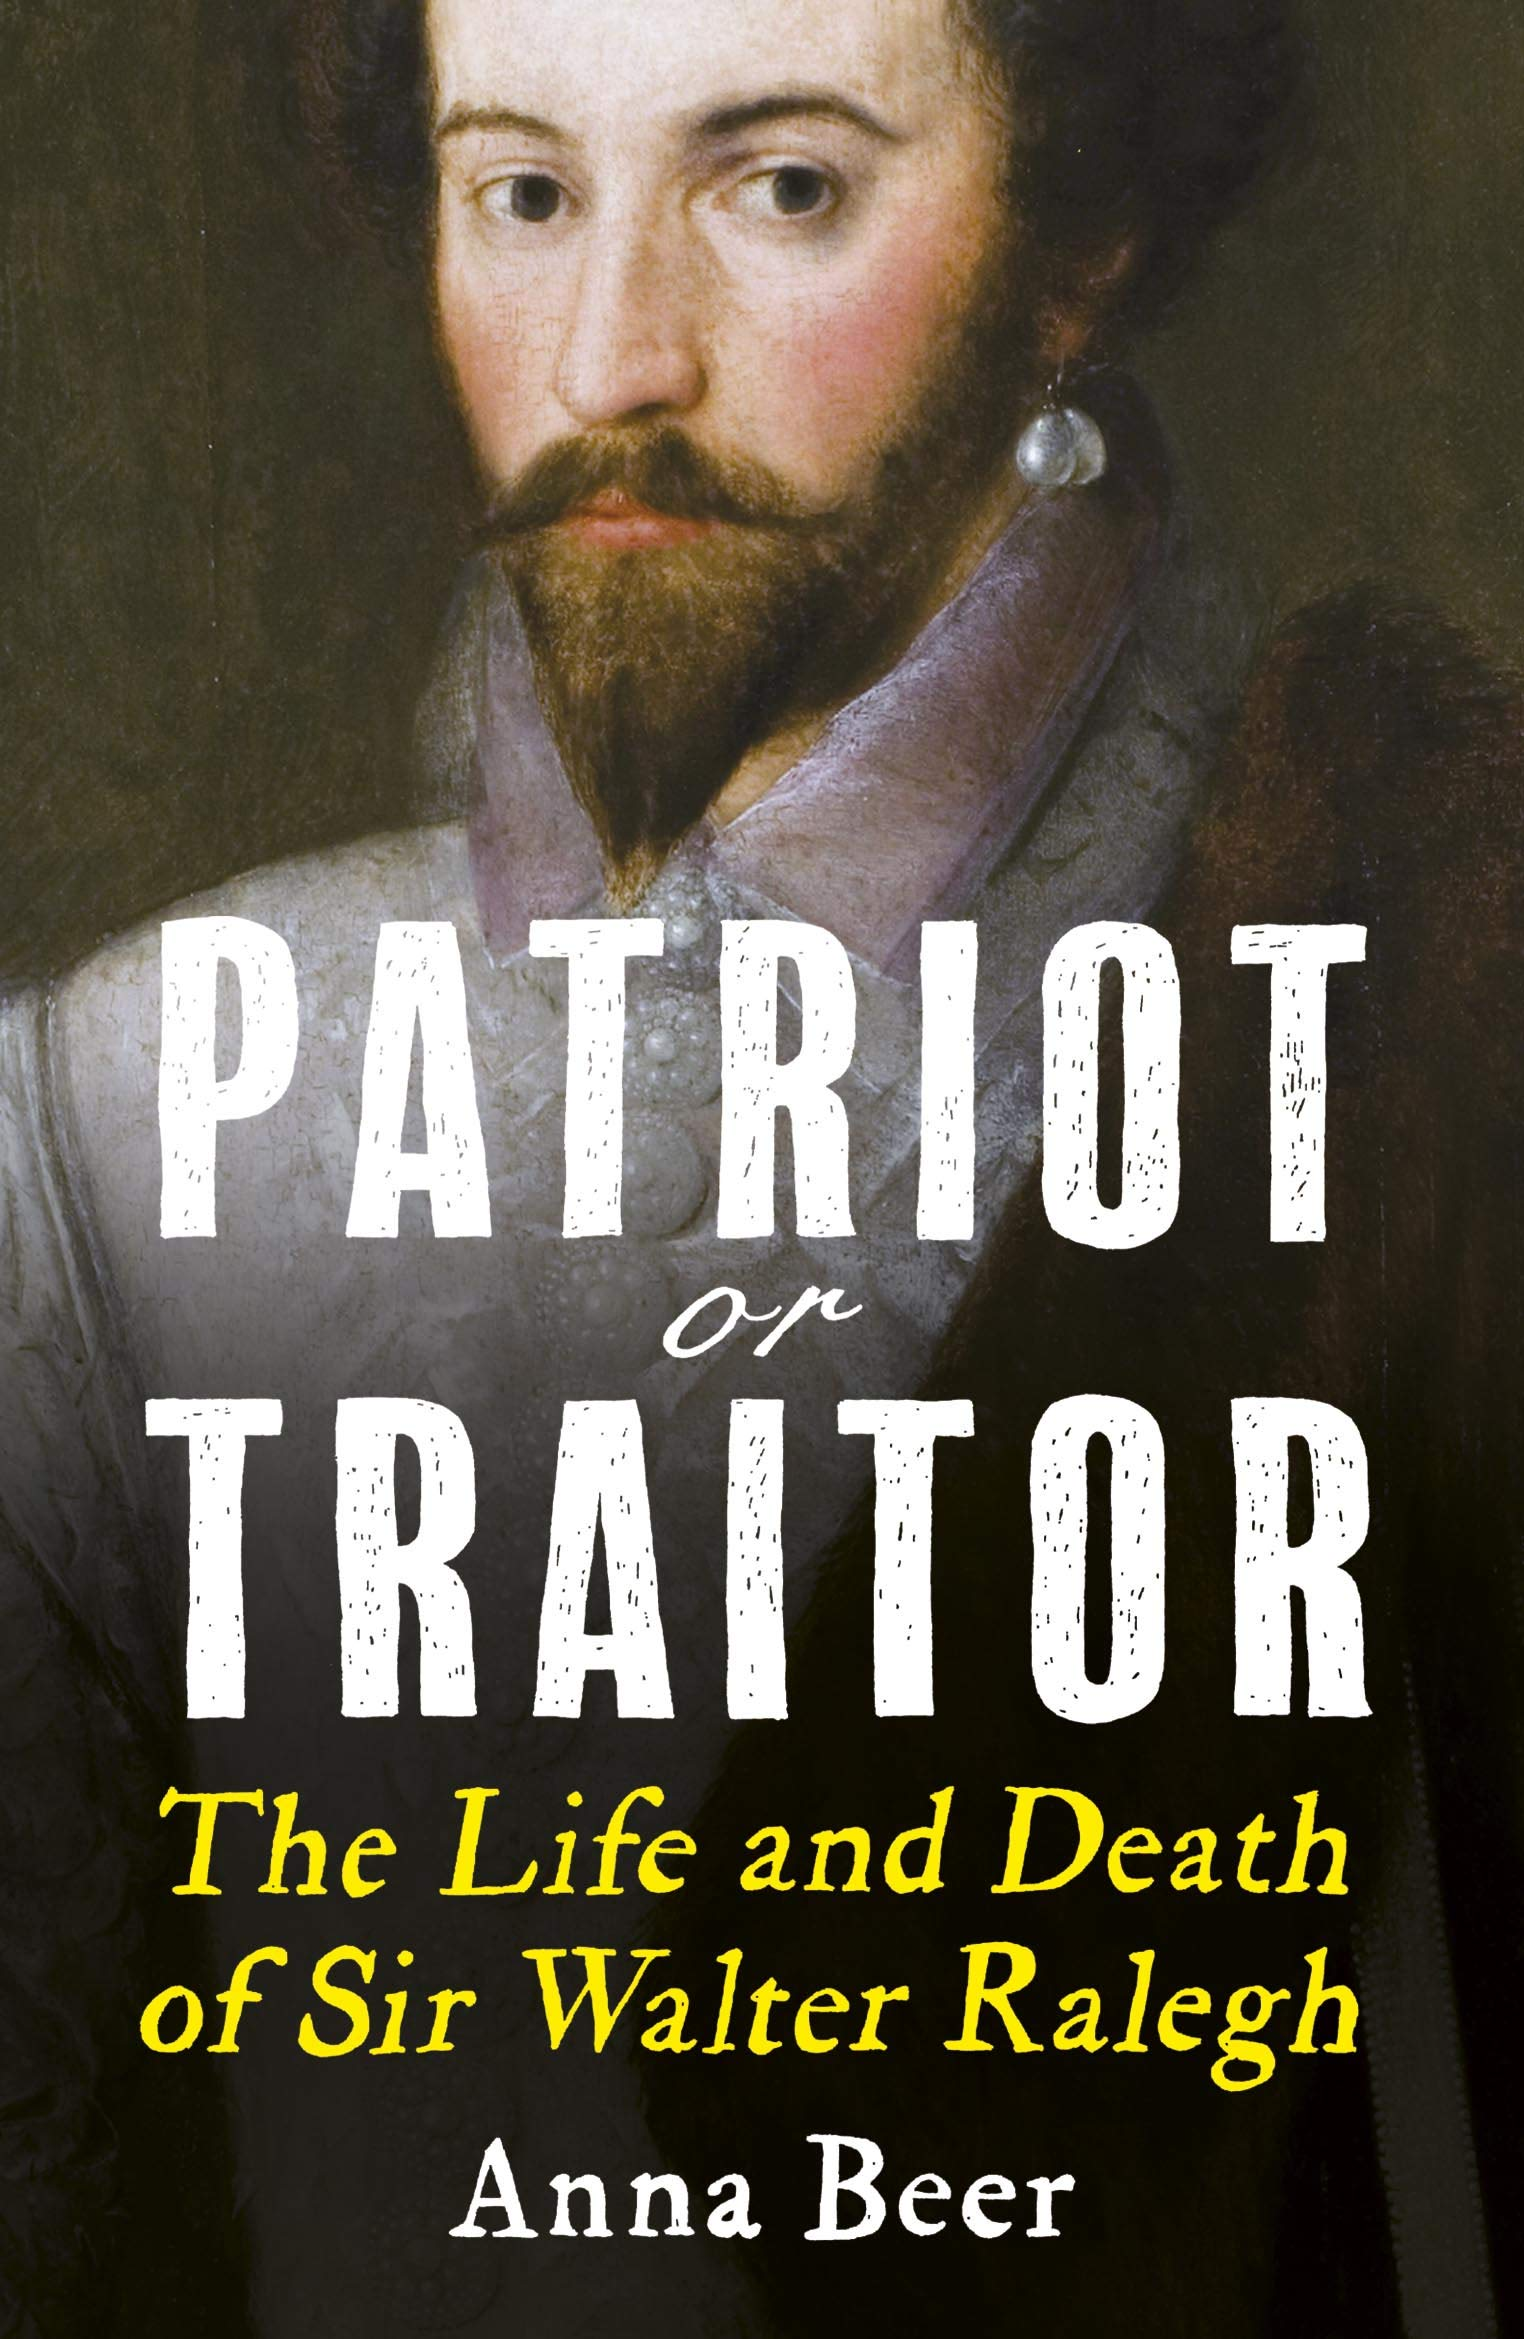 Patriot or traitor the life and death of sir walter ralegh anna beer  fremdsprachige bücher jpg